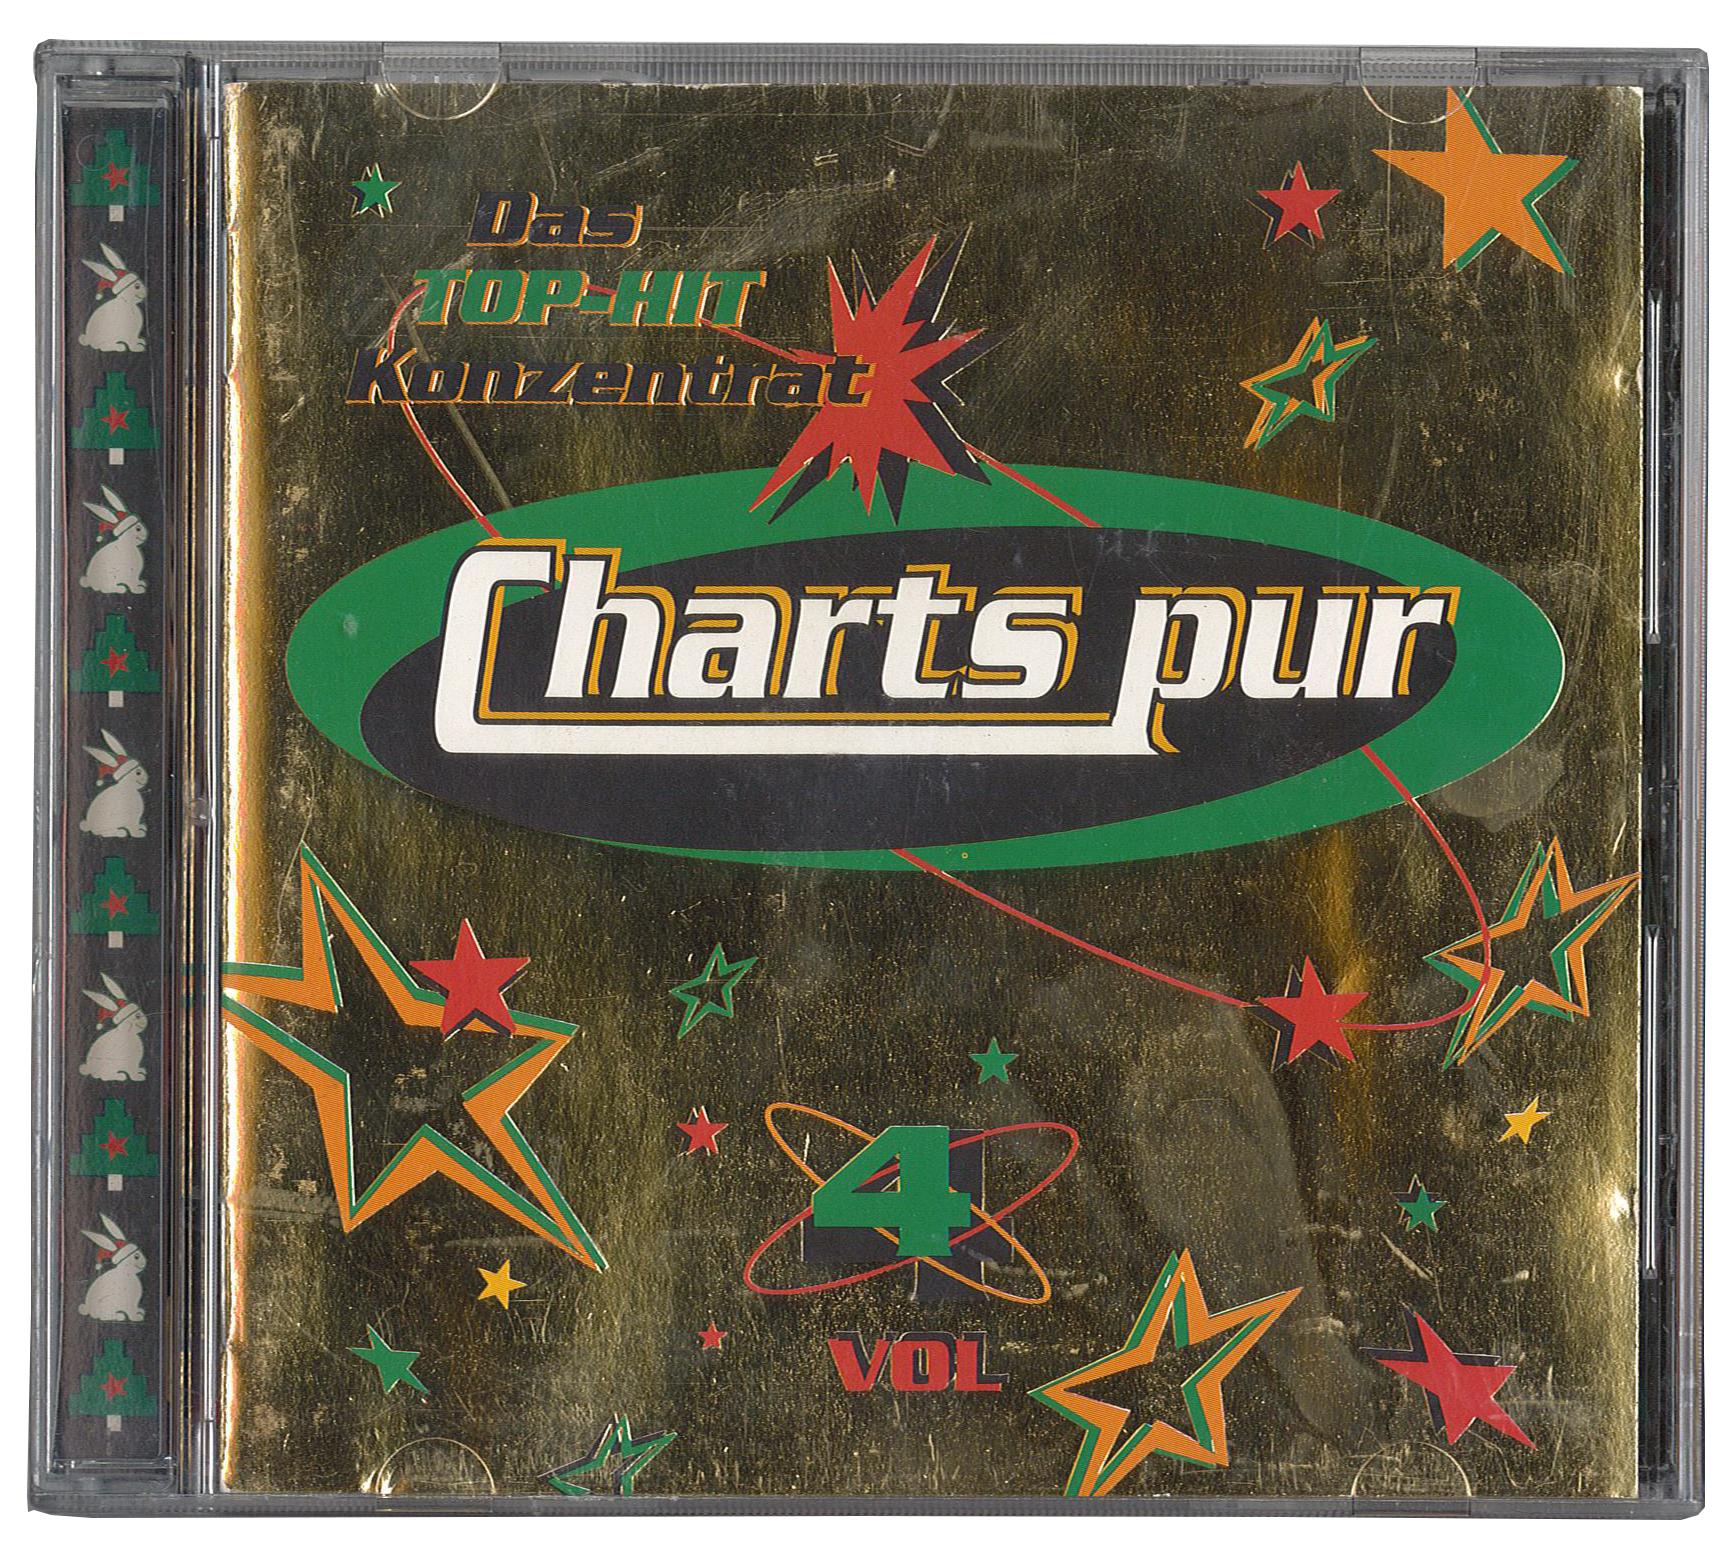 WLWLTDOO-1995-CD-CHARTS_PUR-DAN-481743-2-FRONT.jpg